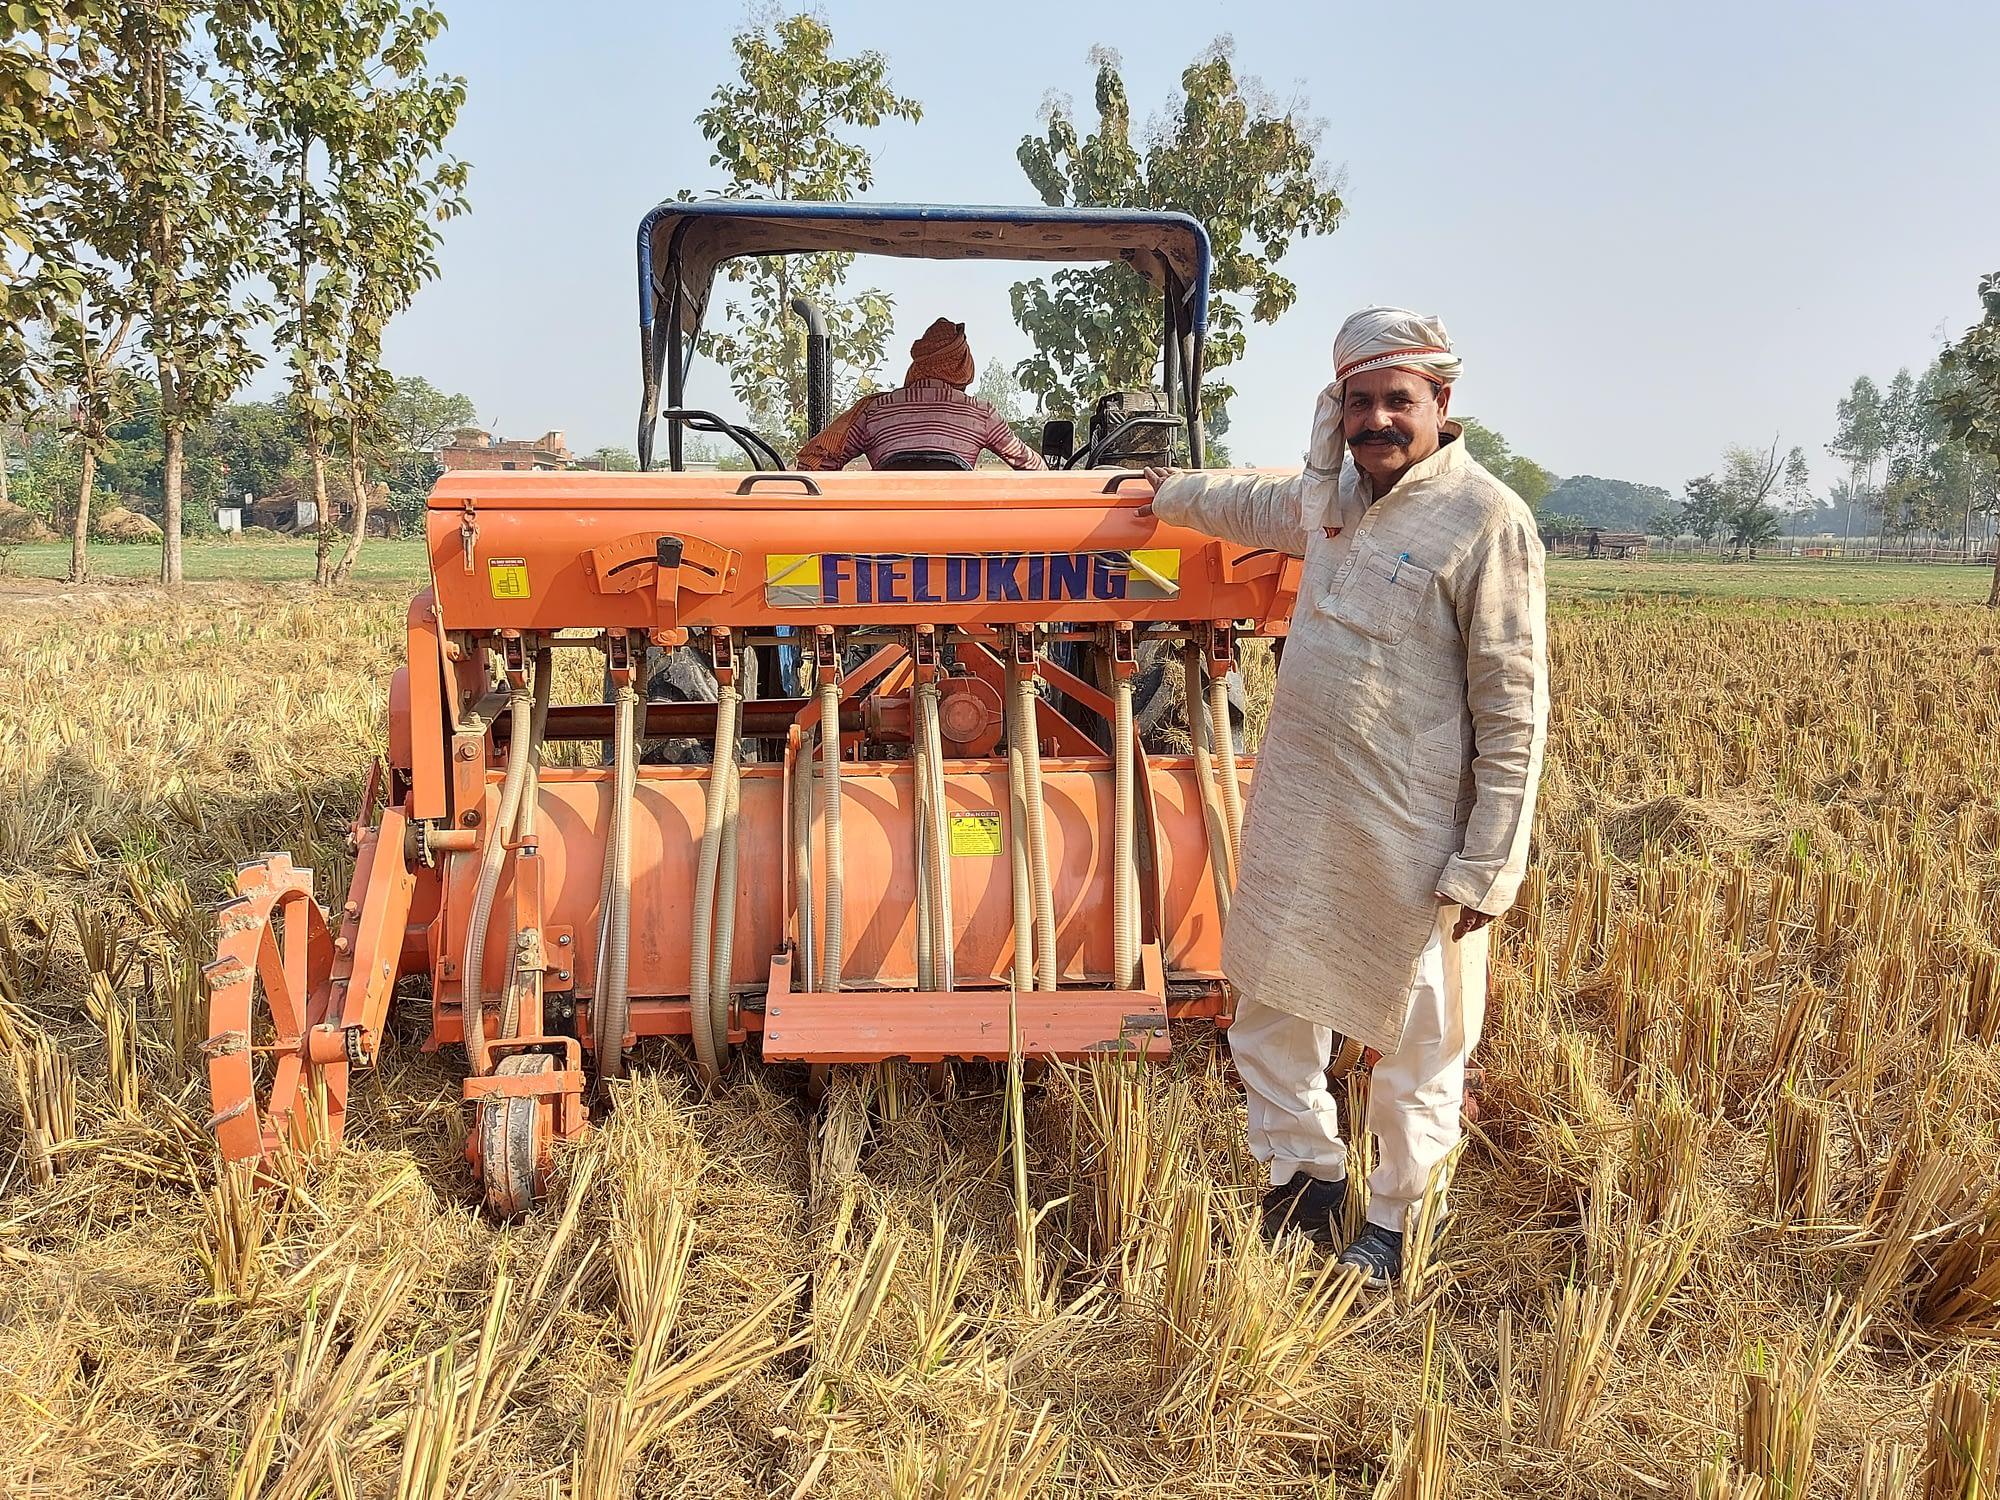 Surender Prasad stands next to his Happy Seeder-mounted tractor in Uttar Pradesh, India. (Photo: Nima Chodon/CIMMYT)